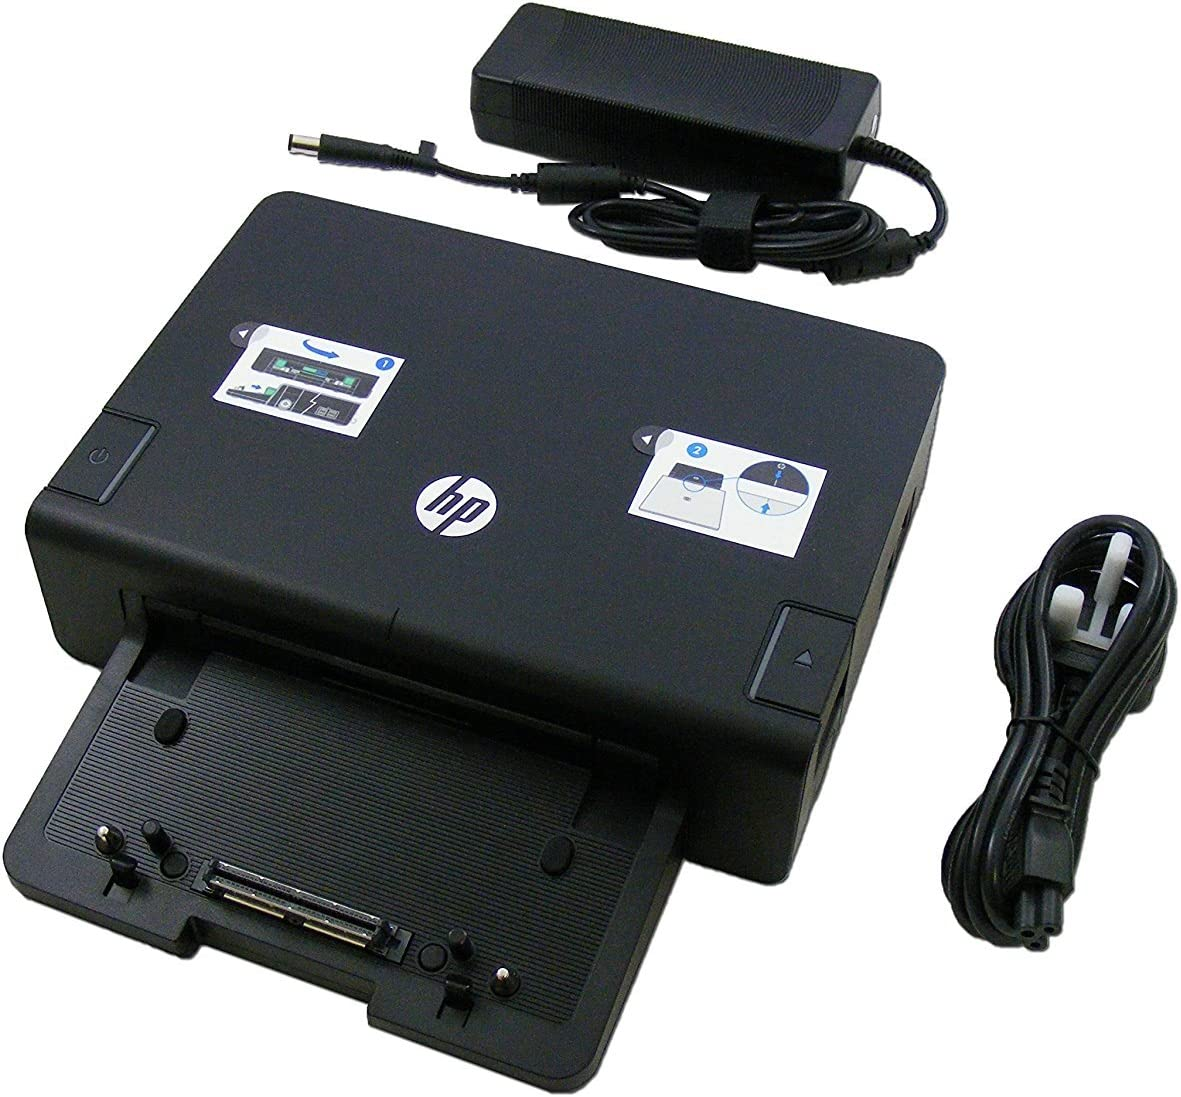 HP A7E36 120W Advanced Docking Station